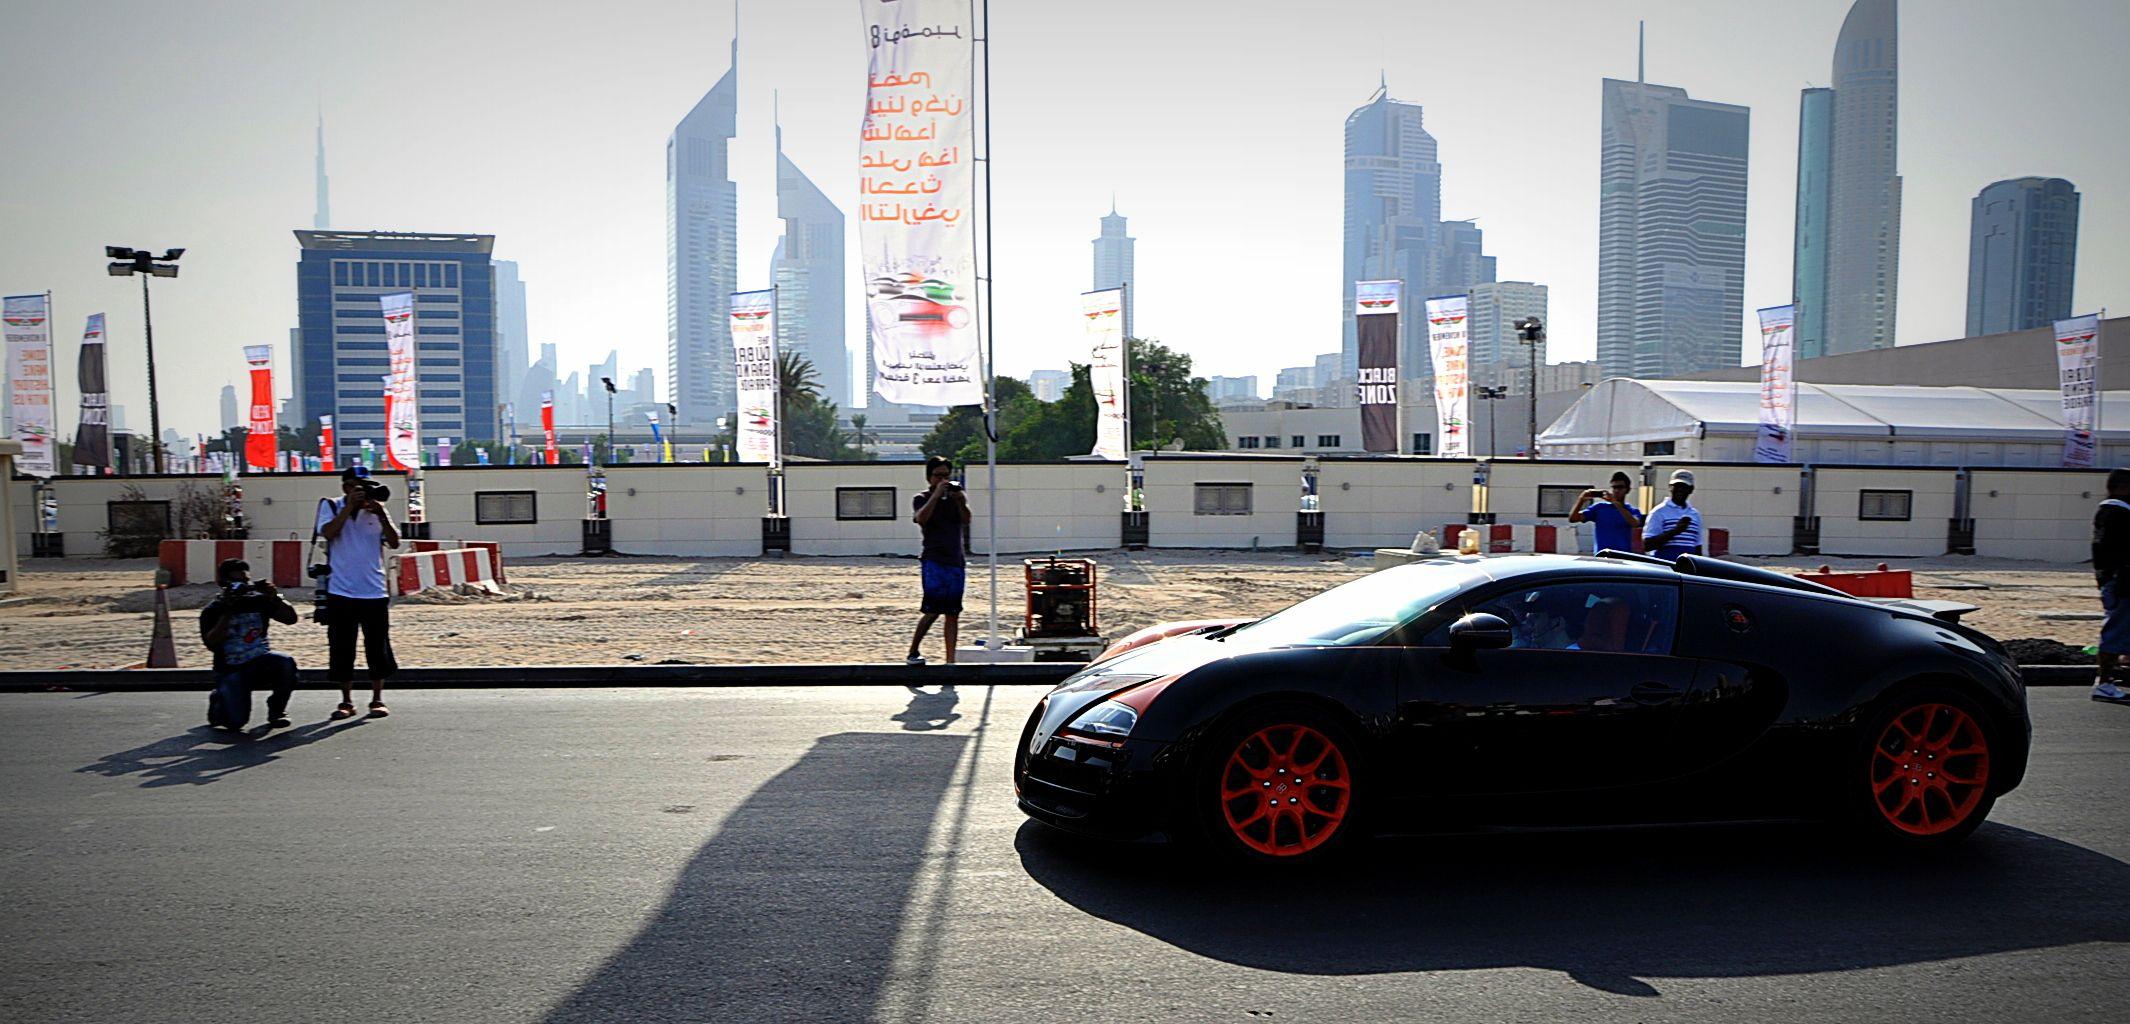 #Dubaigrandparade #Bugatti #Veyron #SuperCar #Dubaicars